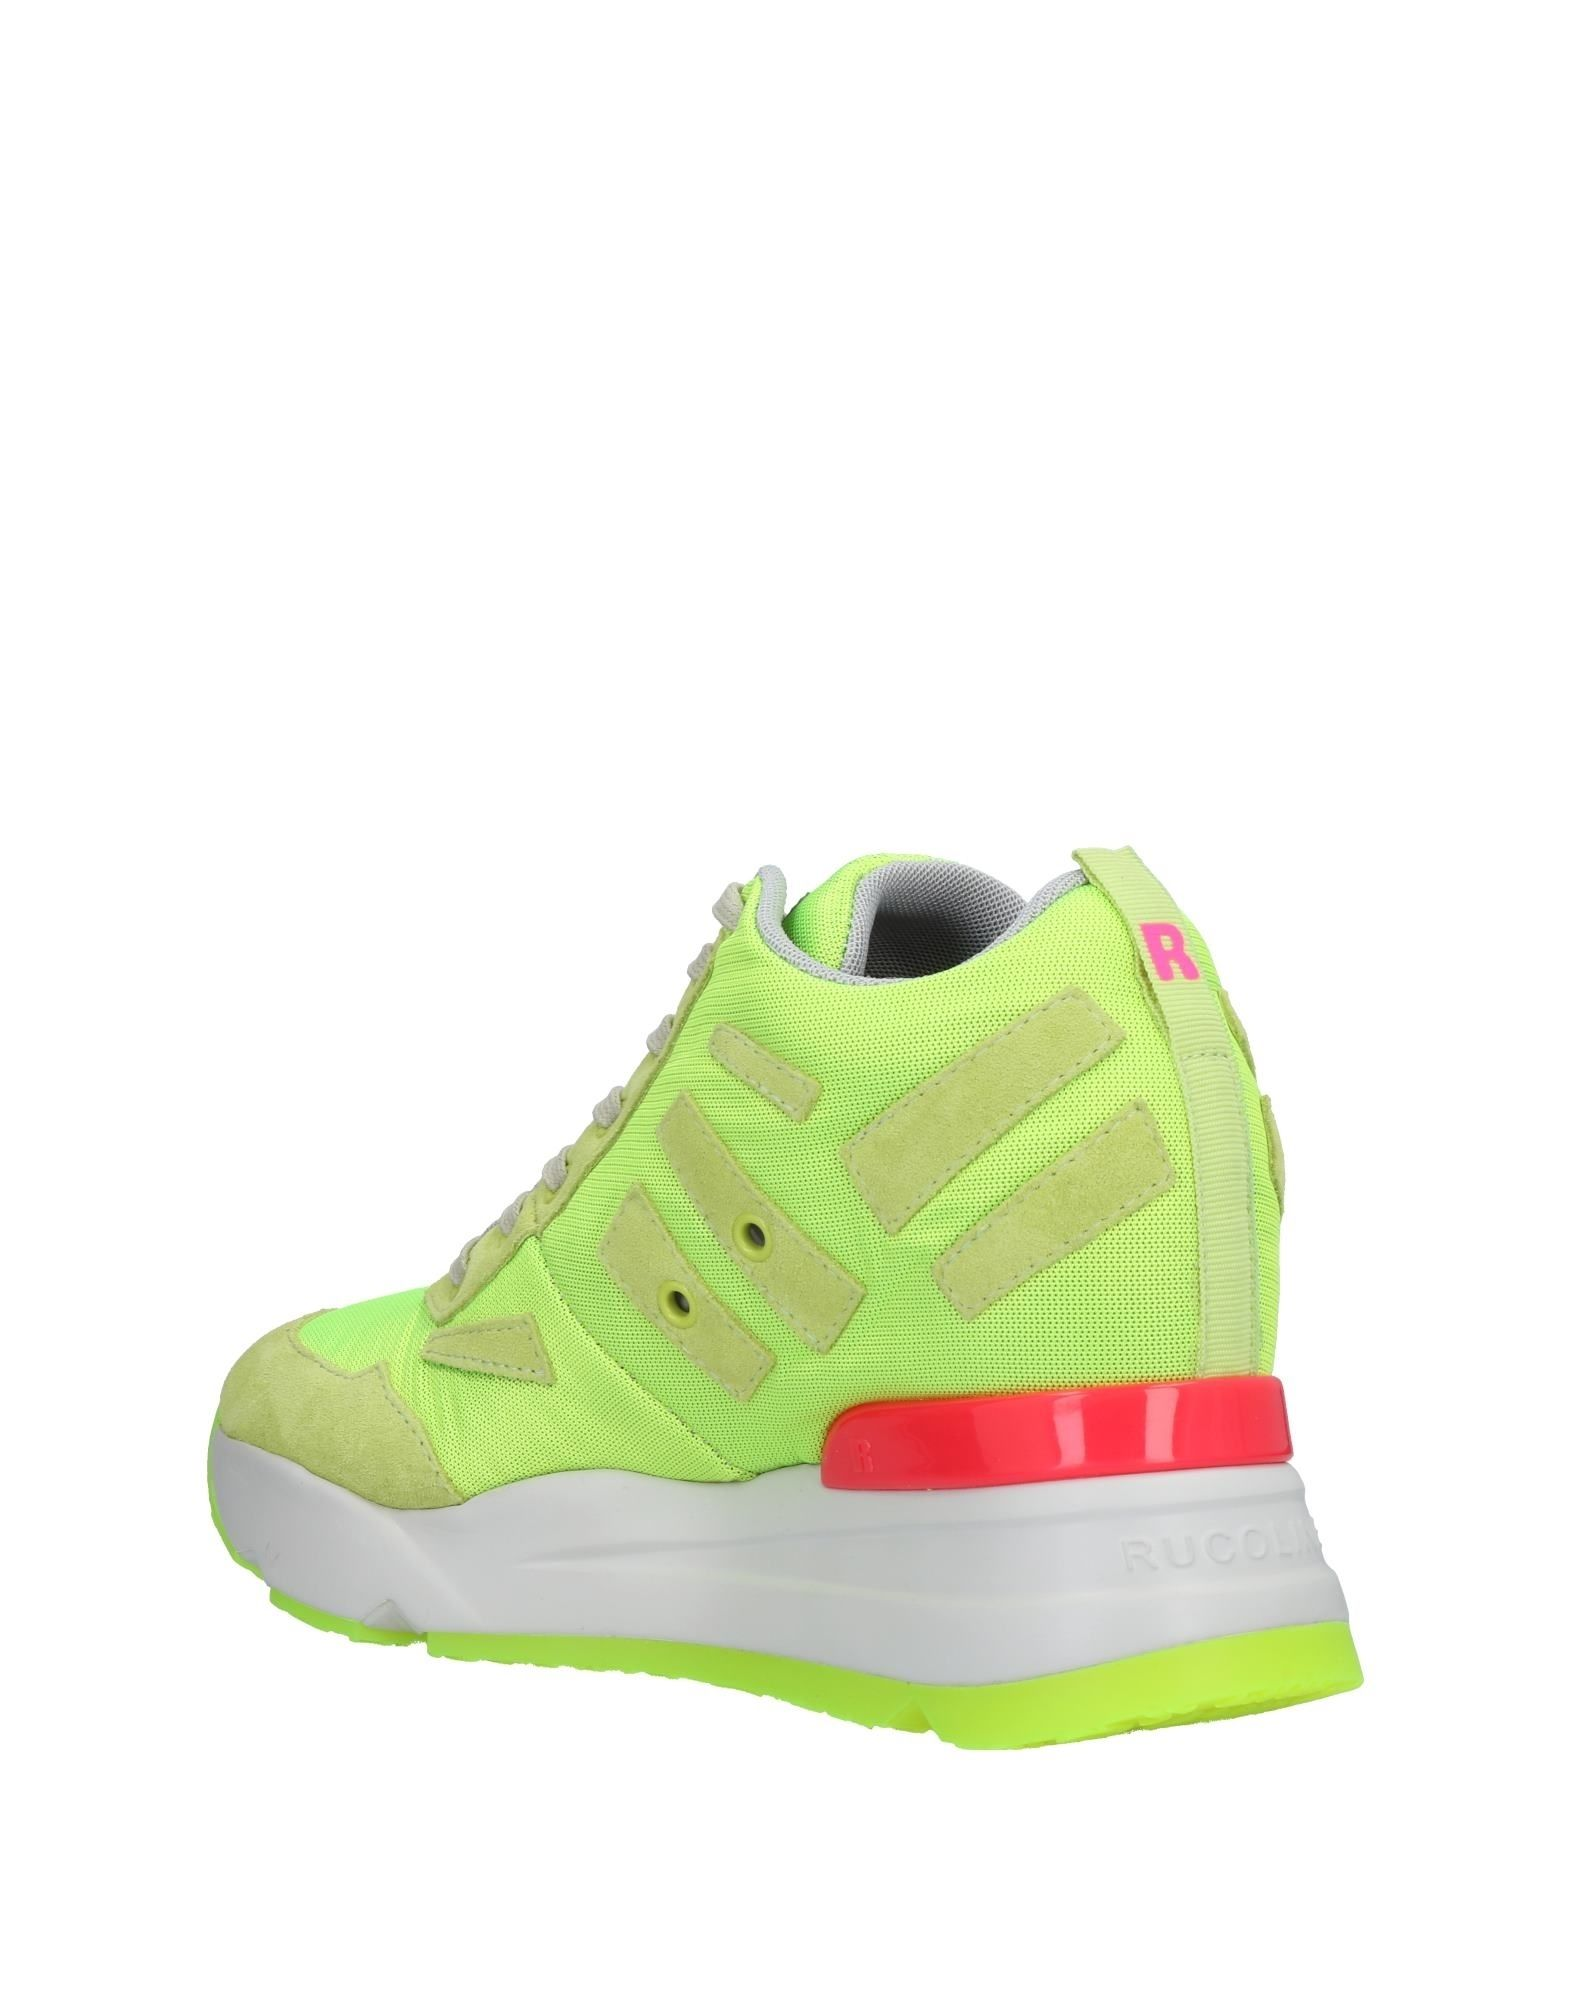 Stilvolle Sneakers billige Schuhe Ruco Line Sneakers Stilvolle Damen  11477728WX 32d82a